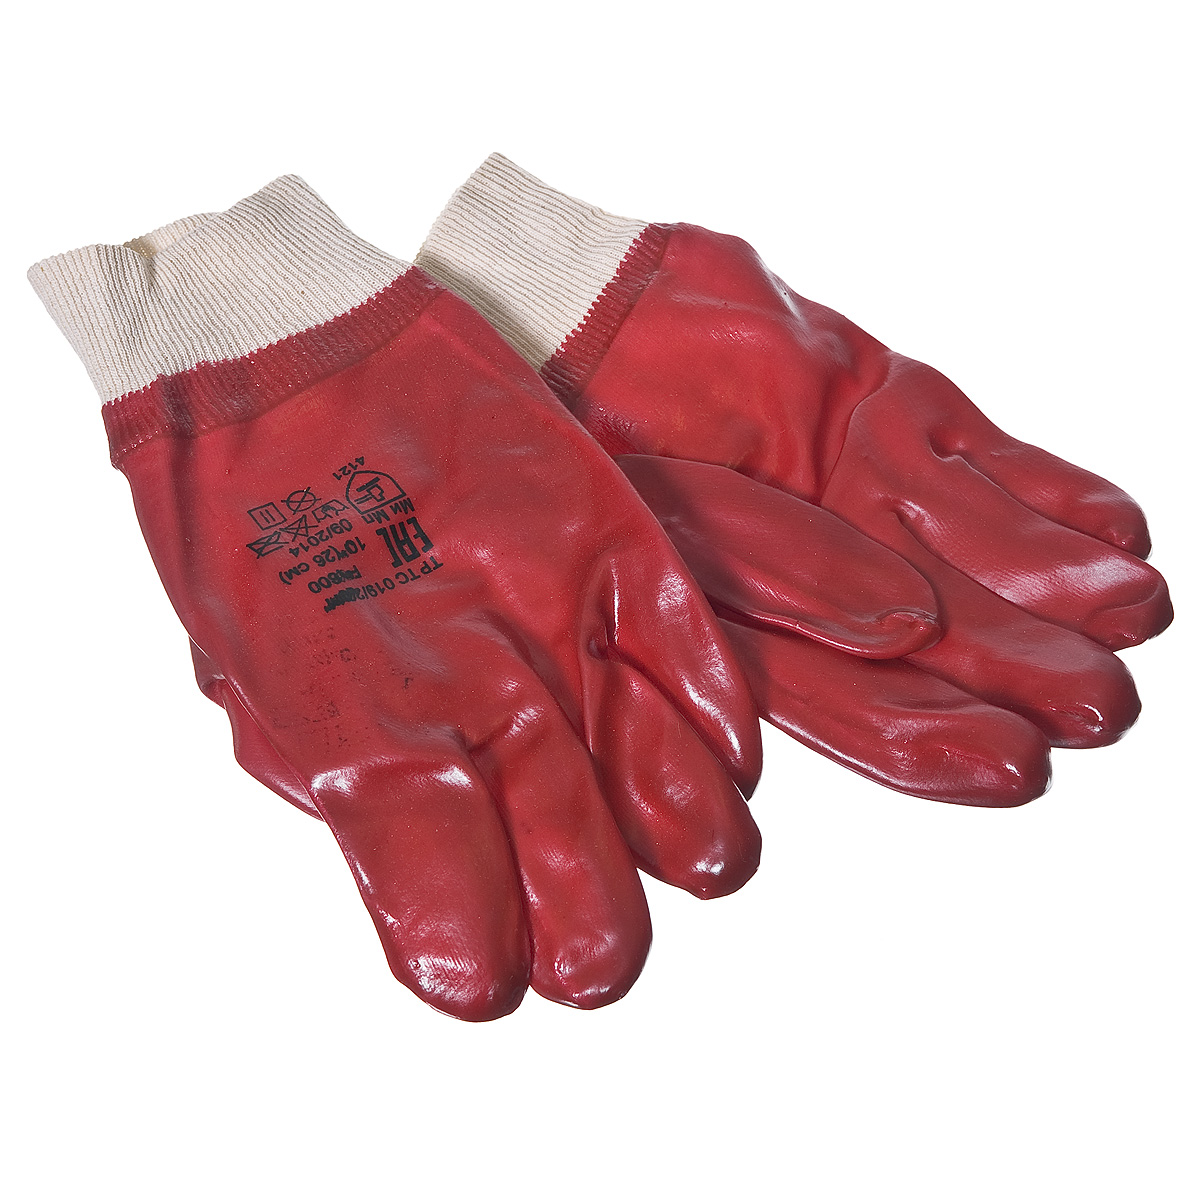 Перчатки х.б. облитые ПВХ МБС, манжета на резинке